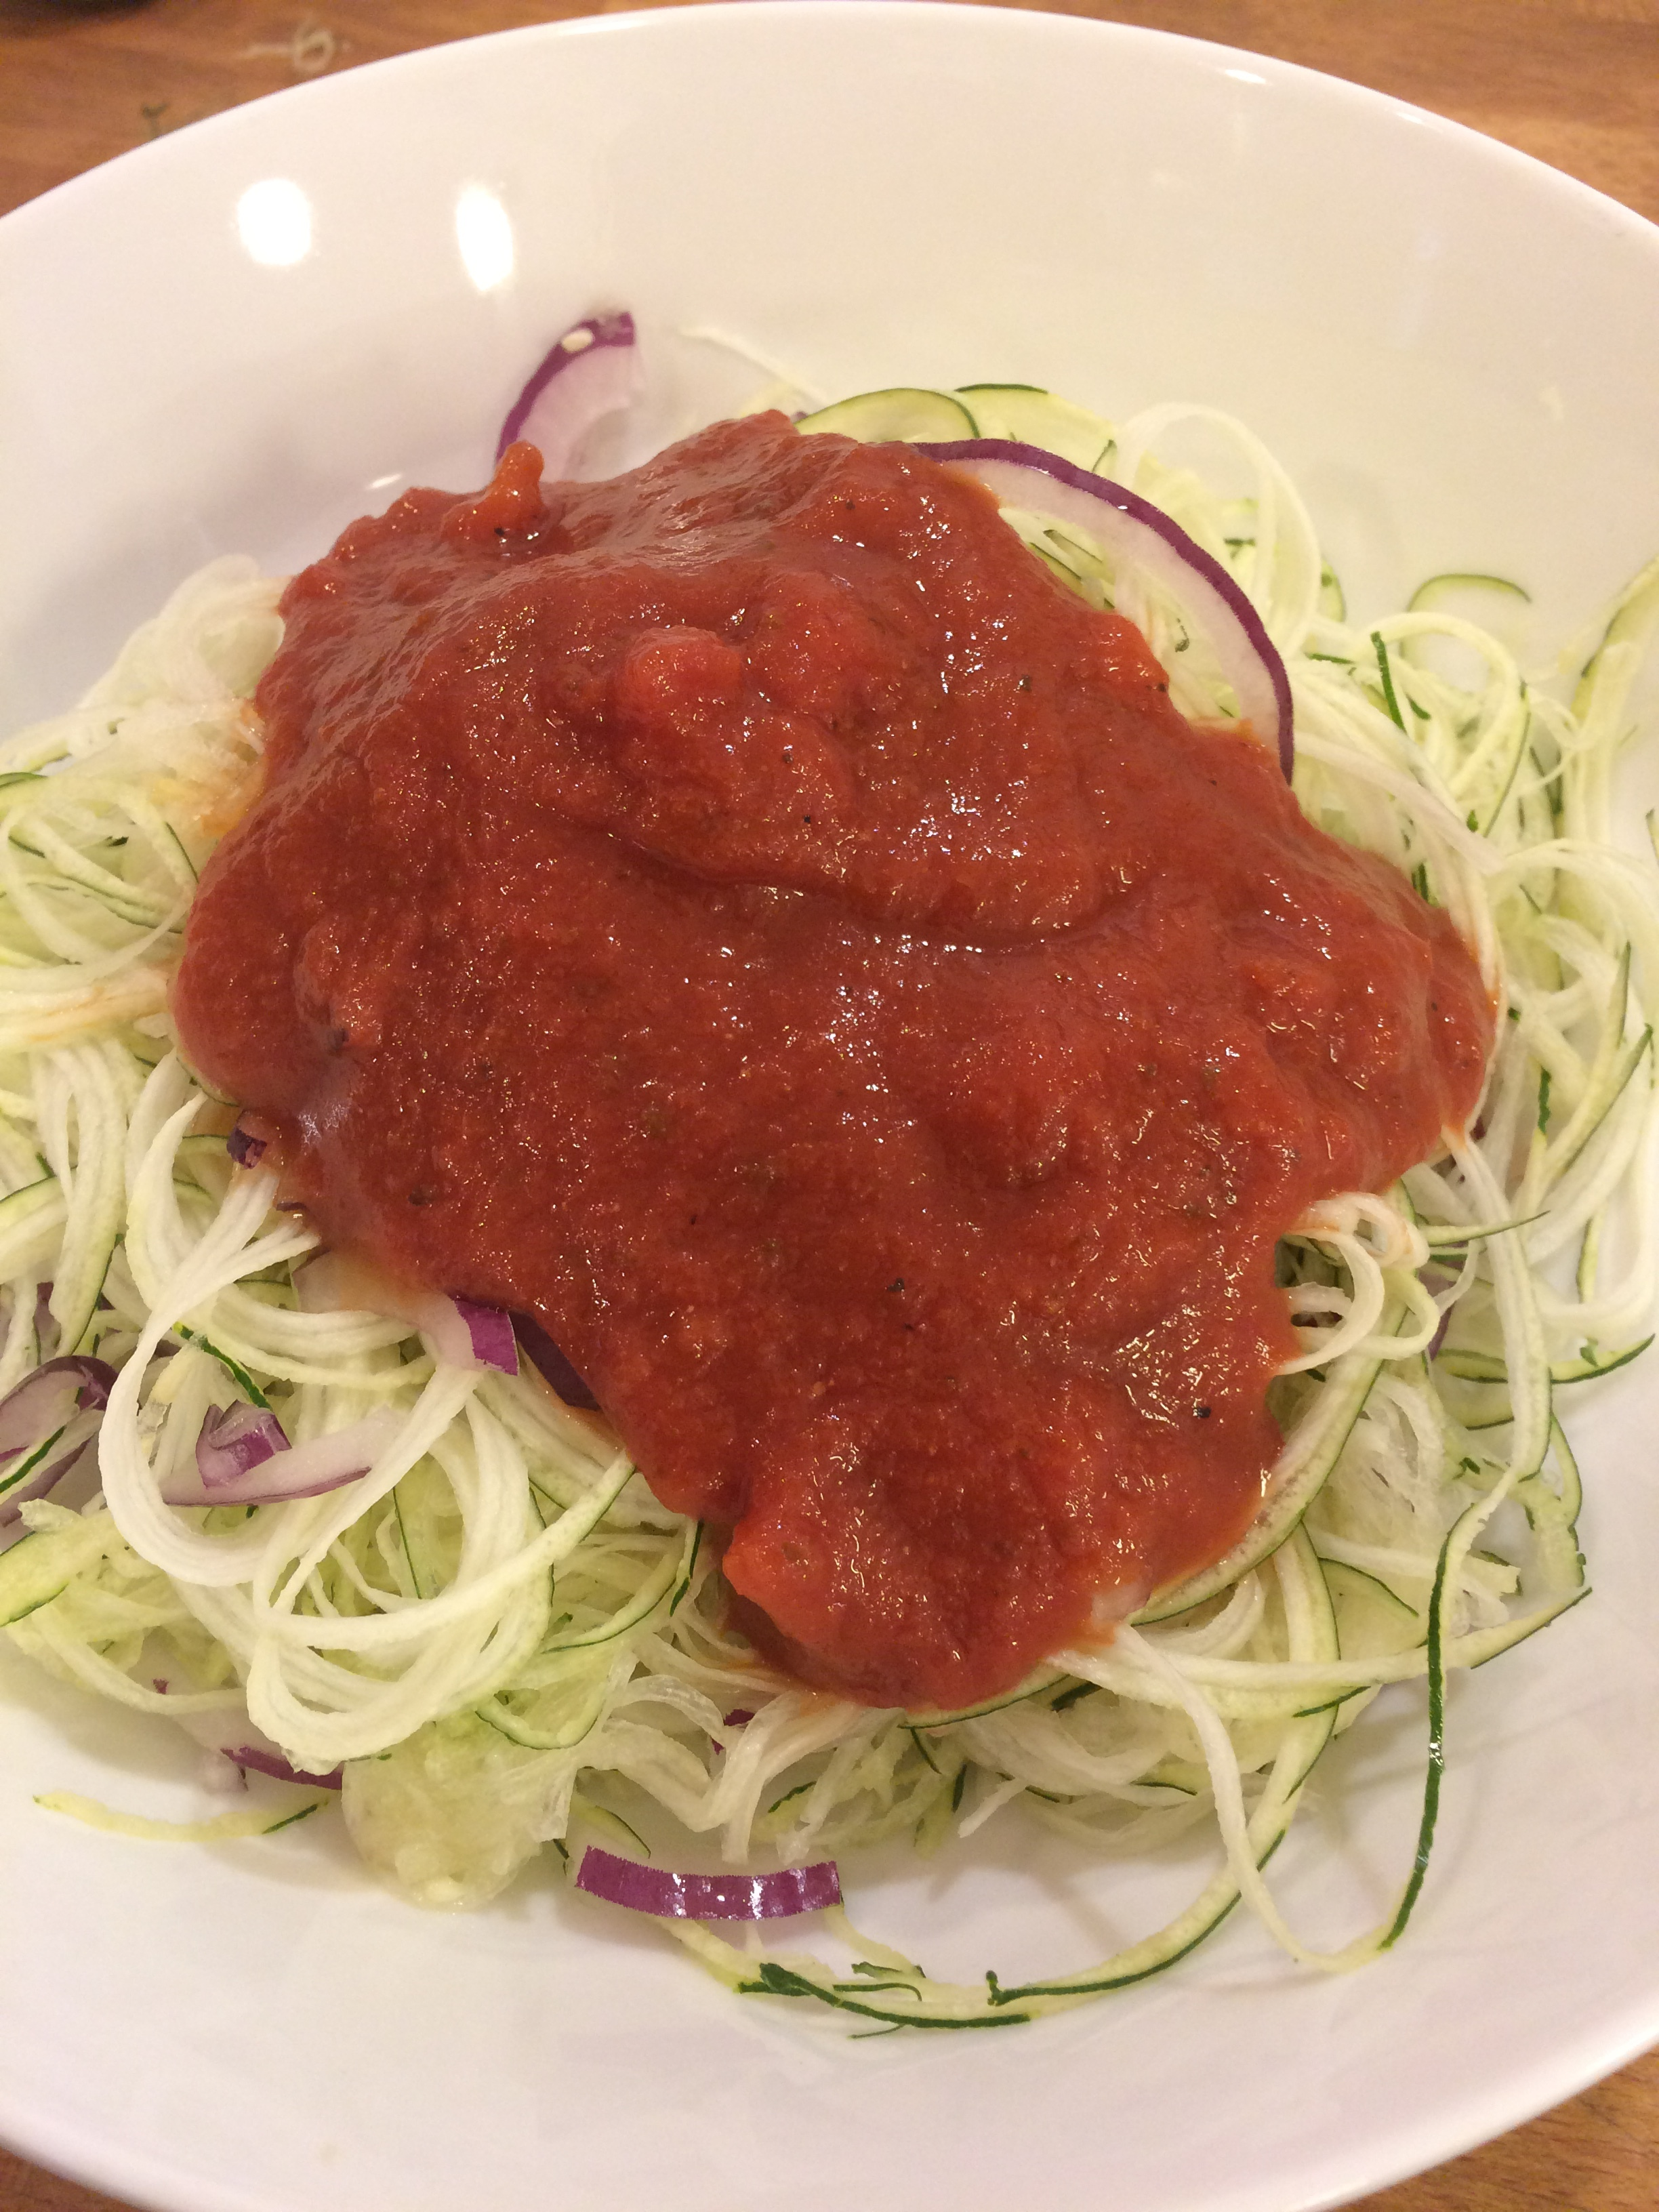 Organic No-Salt Added Tomato Sauce